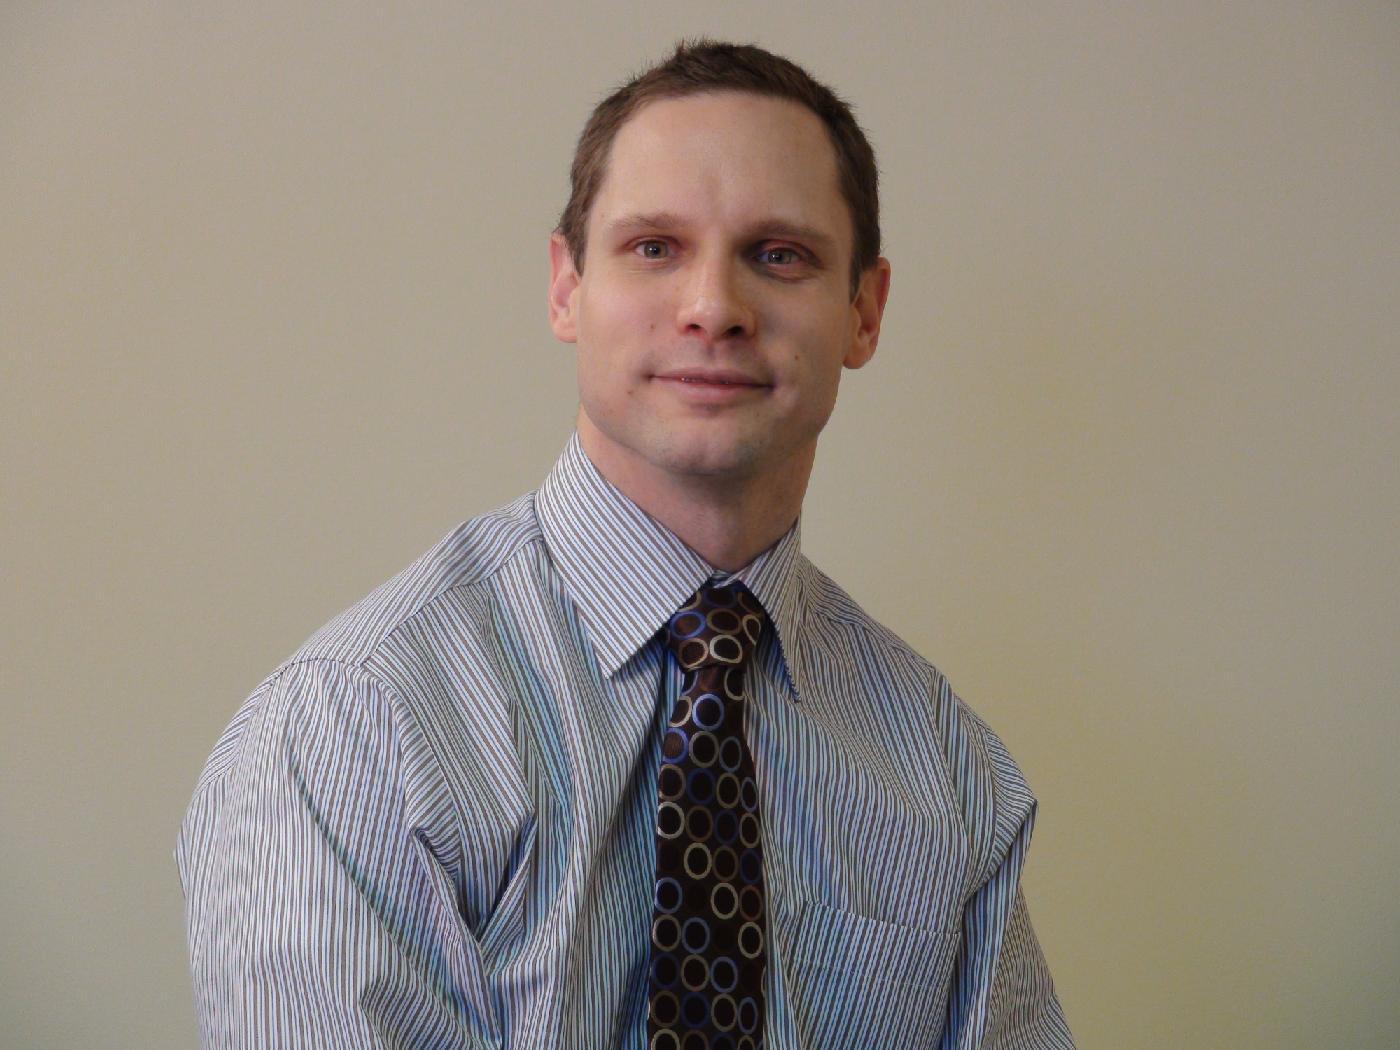 Joshua R. Gill